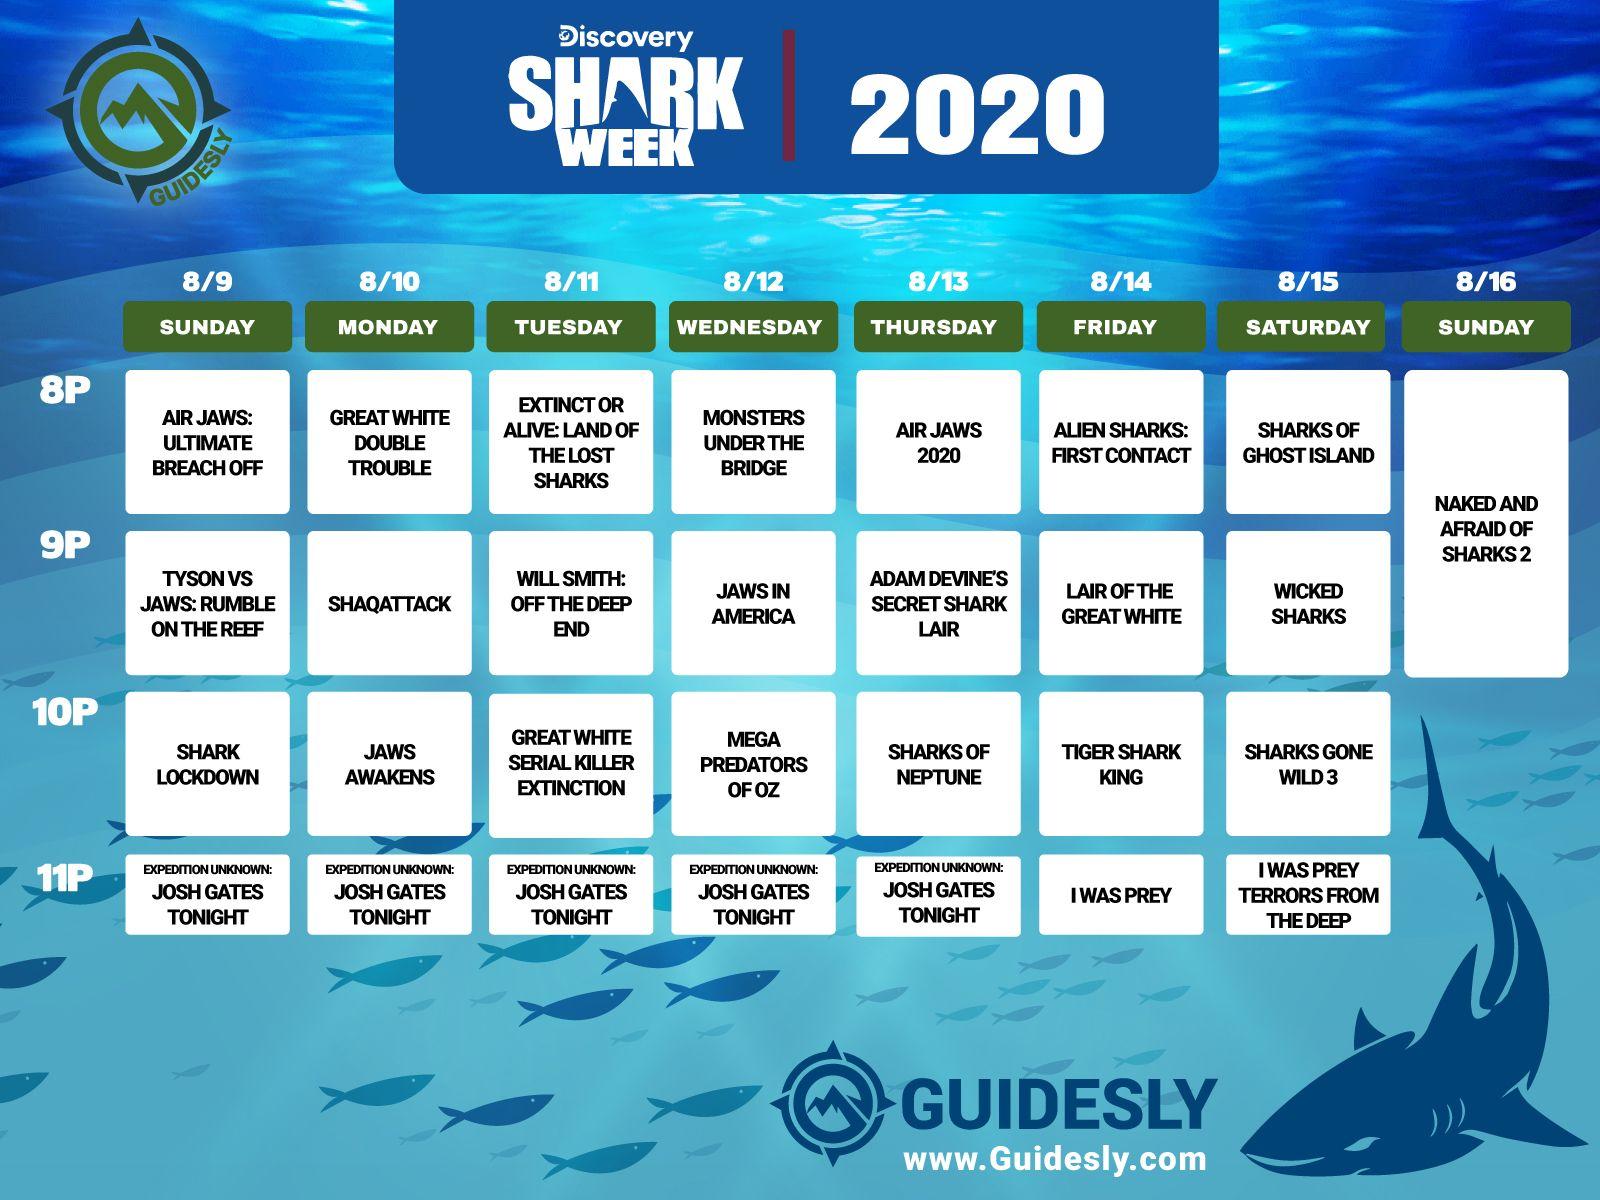 Discovery_SharkWeek_Schedule_2020_01b